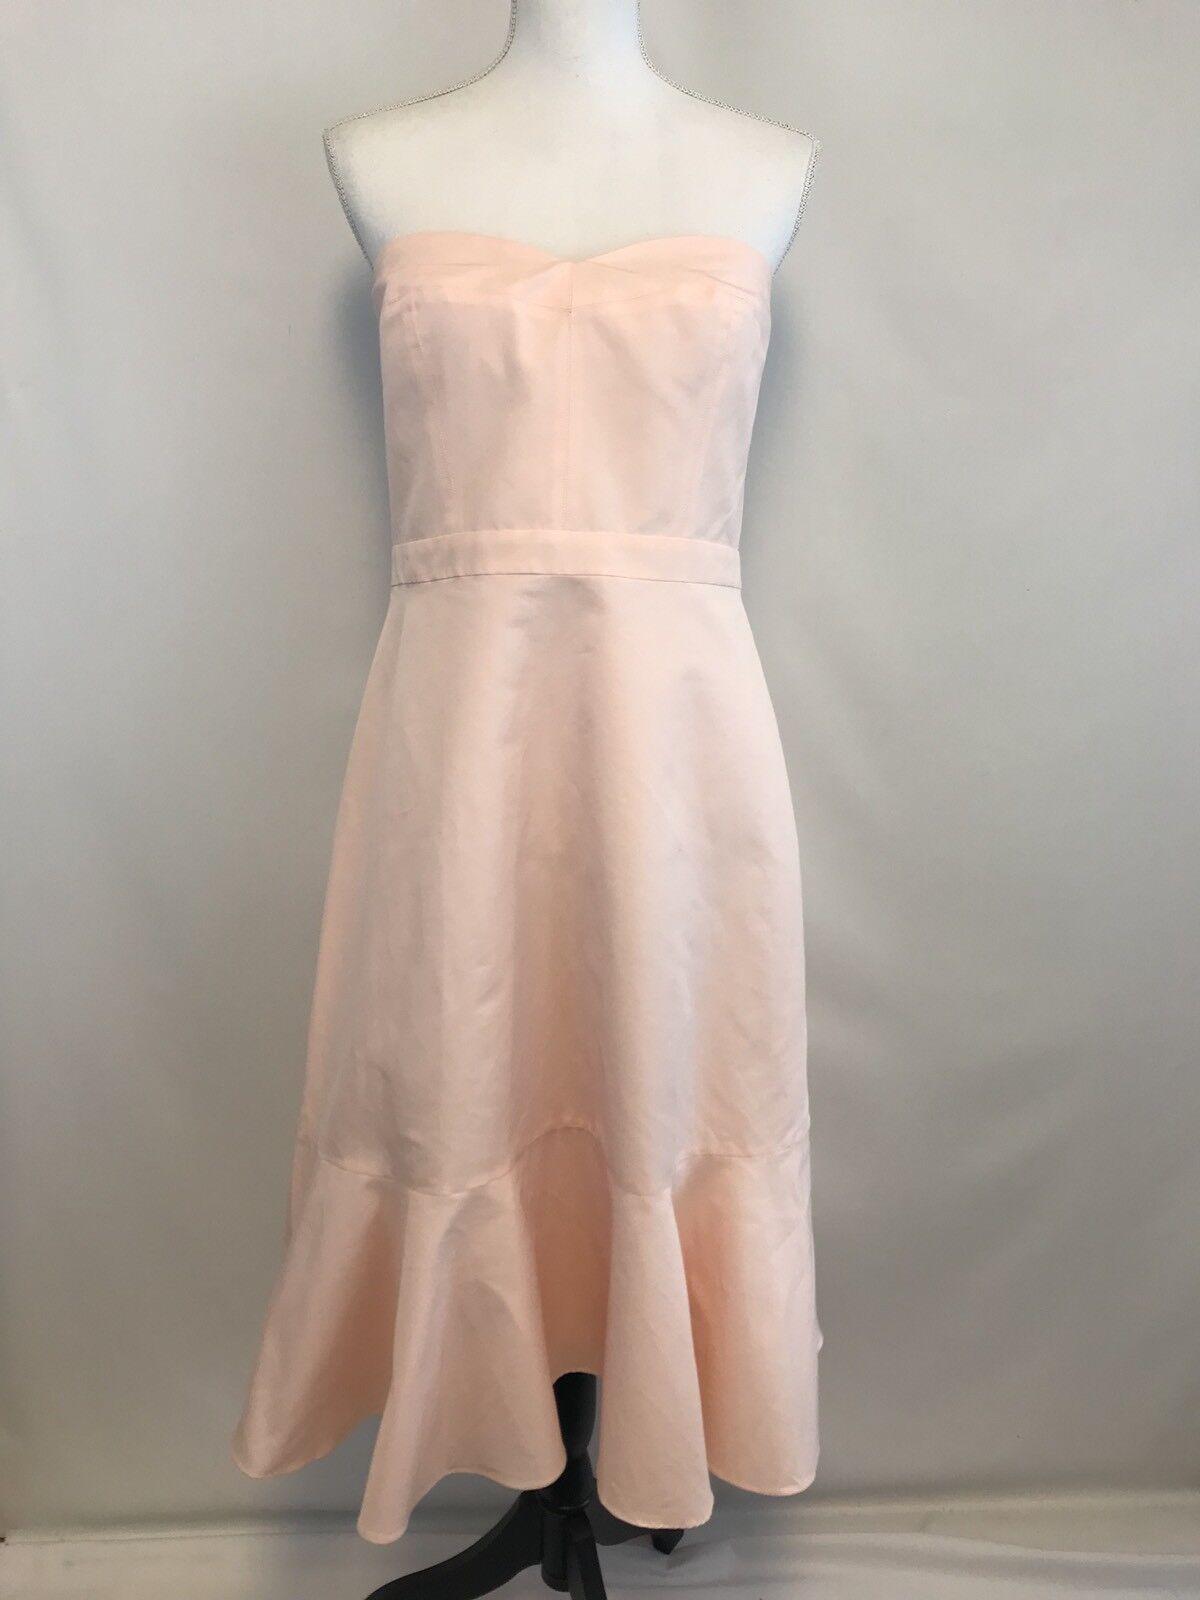 J.CREW  168 Strapless Ruffle-Hem Dress in Faille Sz 14 Pink g3470